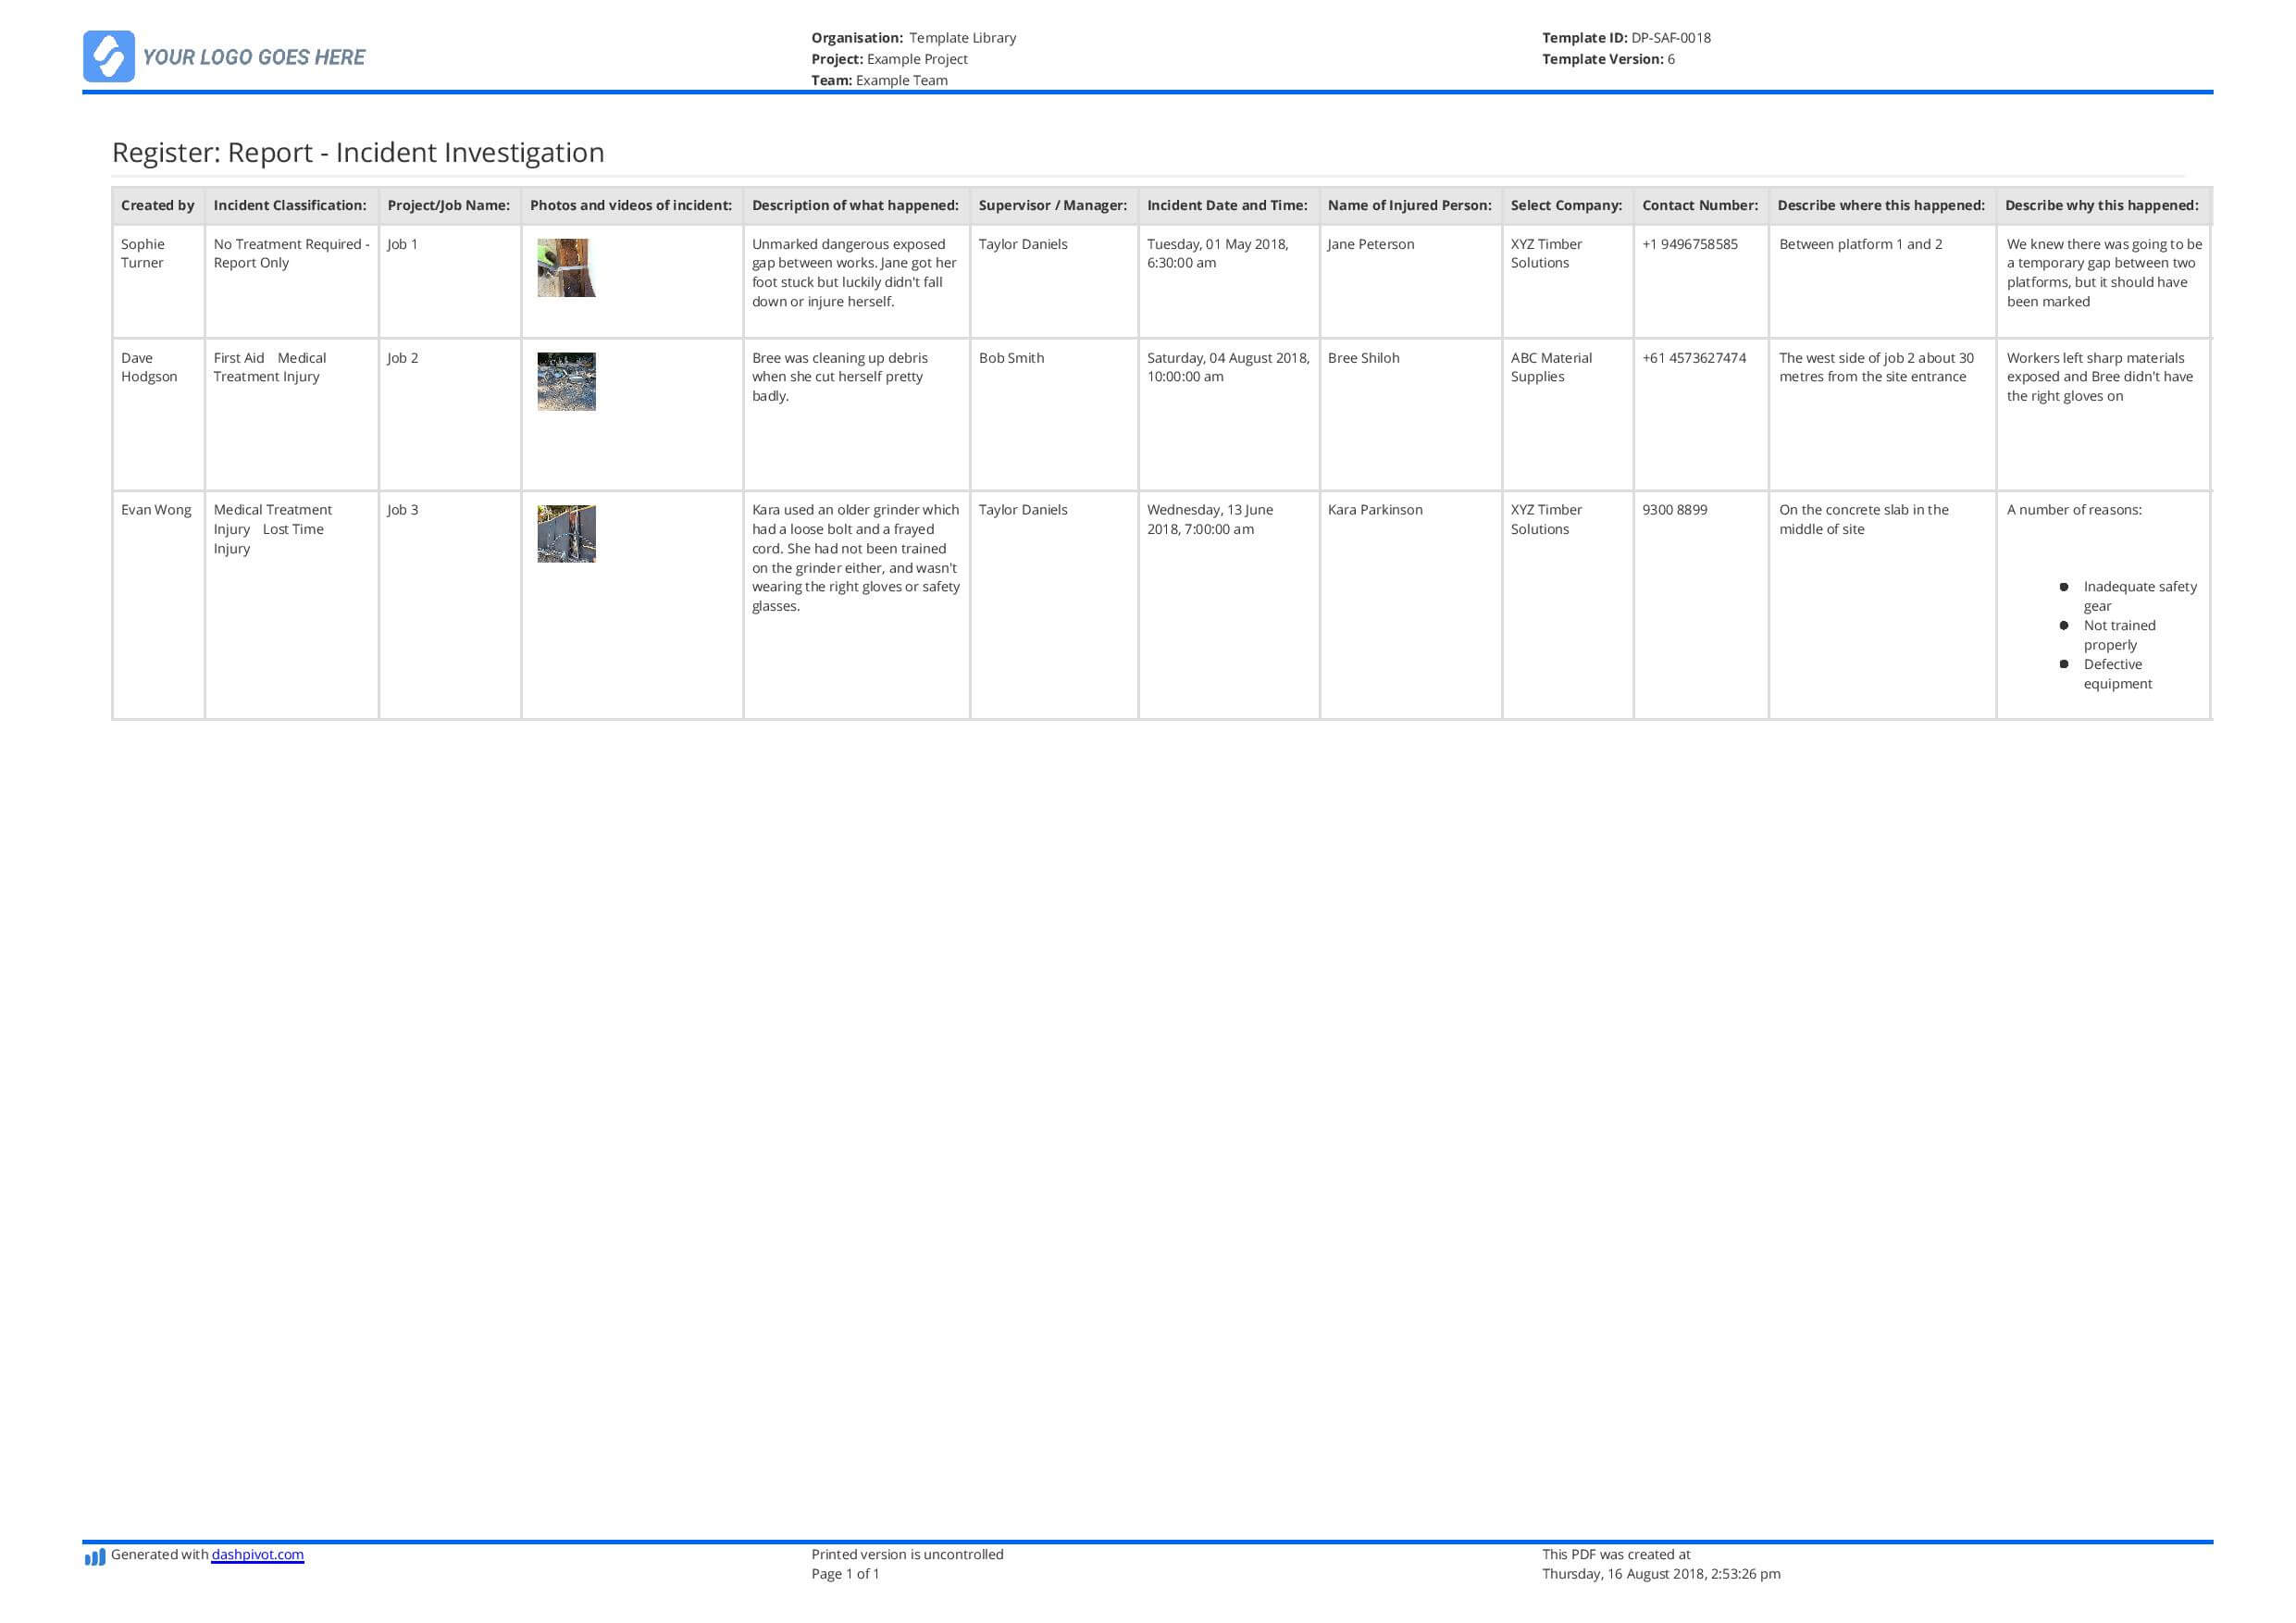 Incident Register Template (Better Than Excel) - Free And Inside Incident Report Register Template